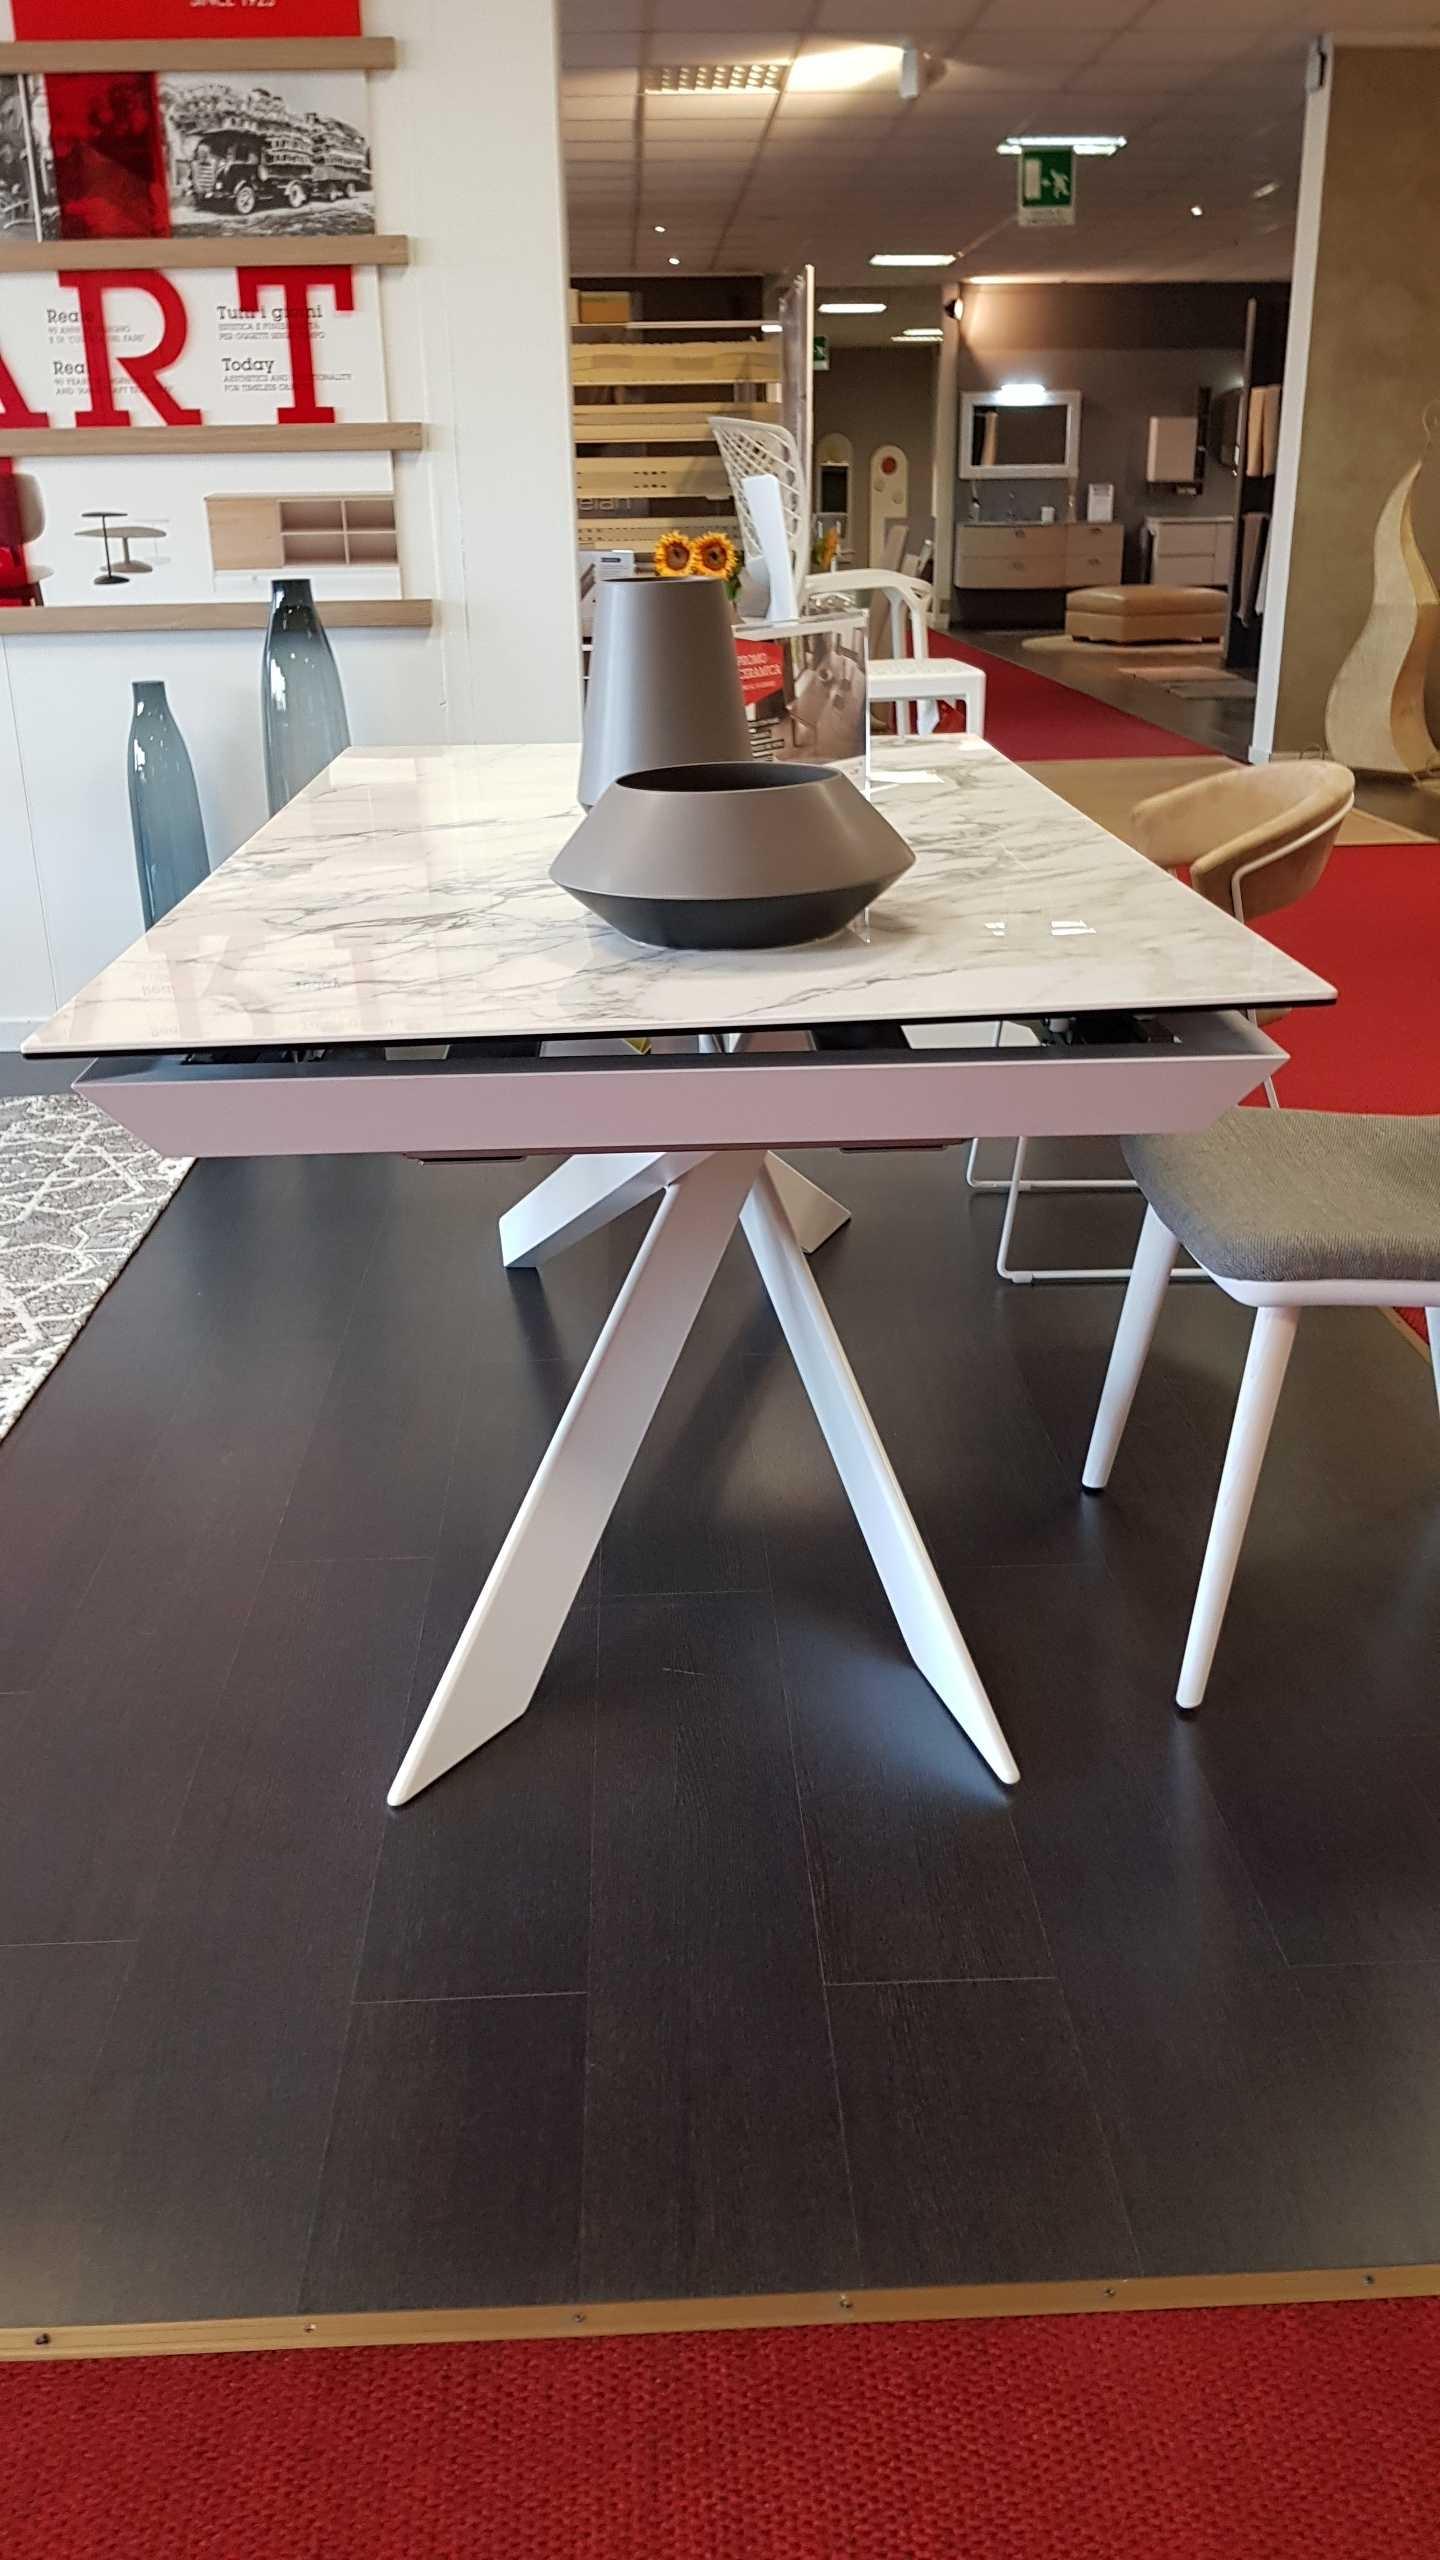 Outlet tavolo eclisse calligaris tavoli a prezzi scontati - Tavolo eclisse calligaris ...